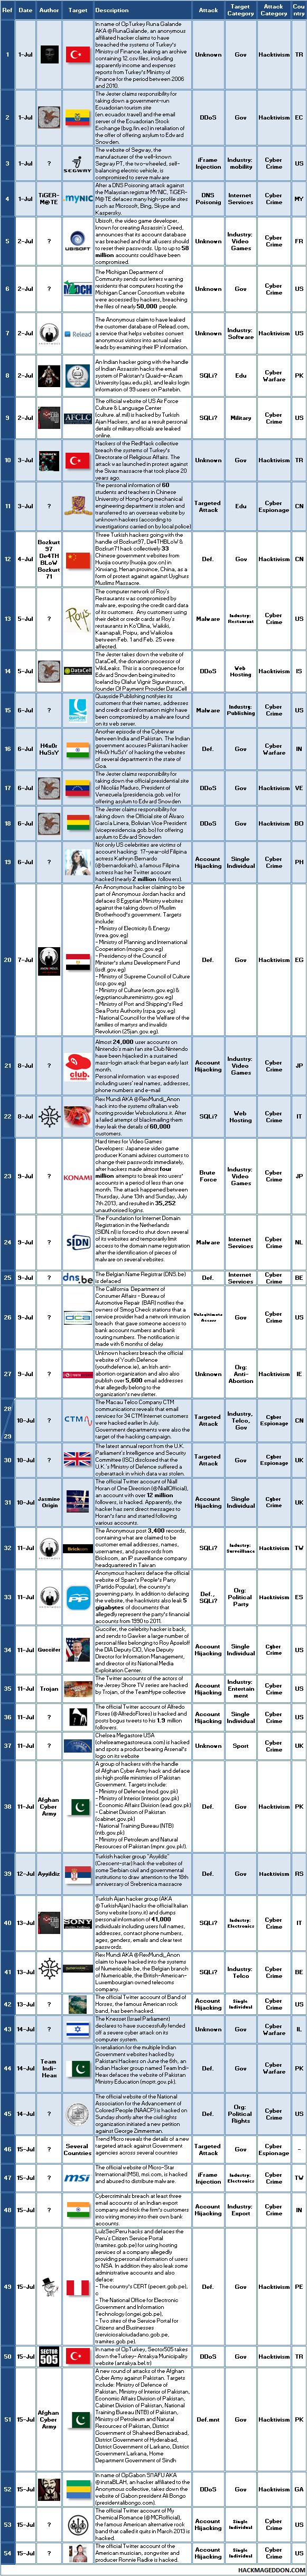 1-15 July 2013 Cyber Attacks Timeline